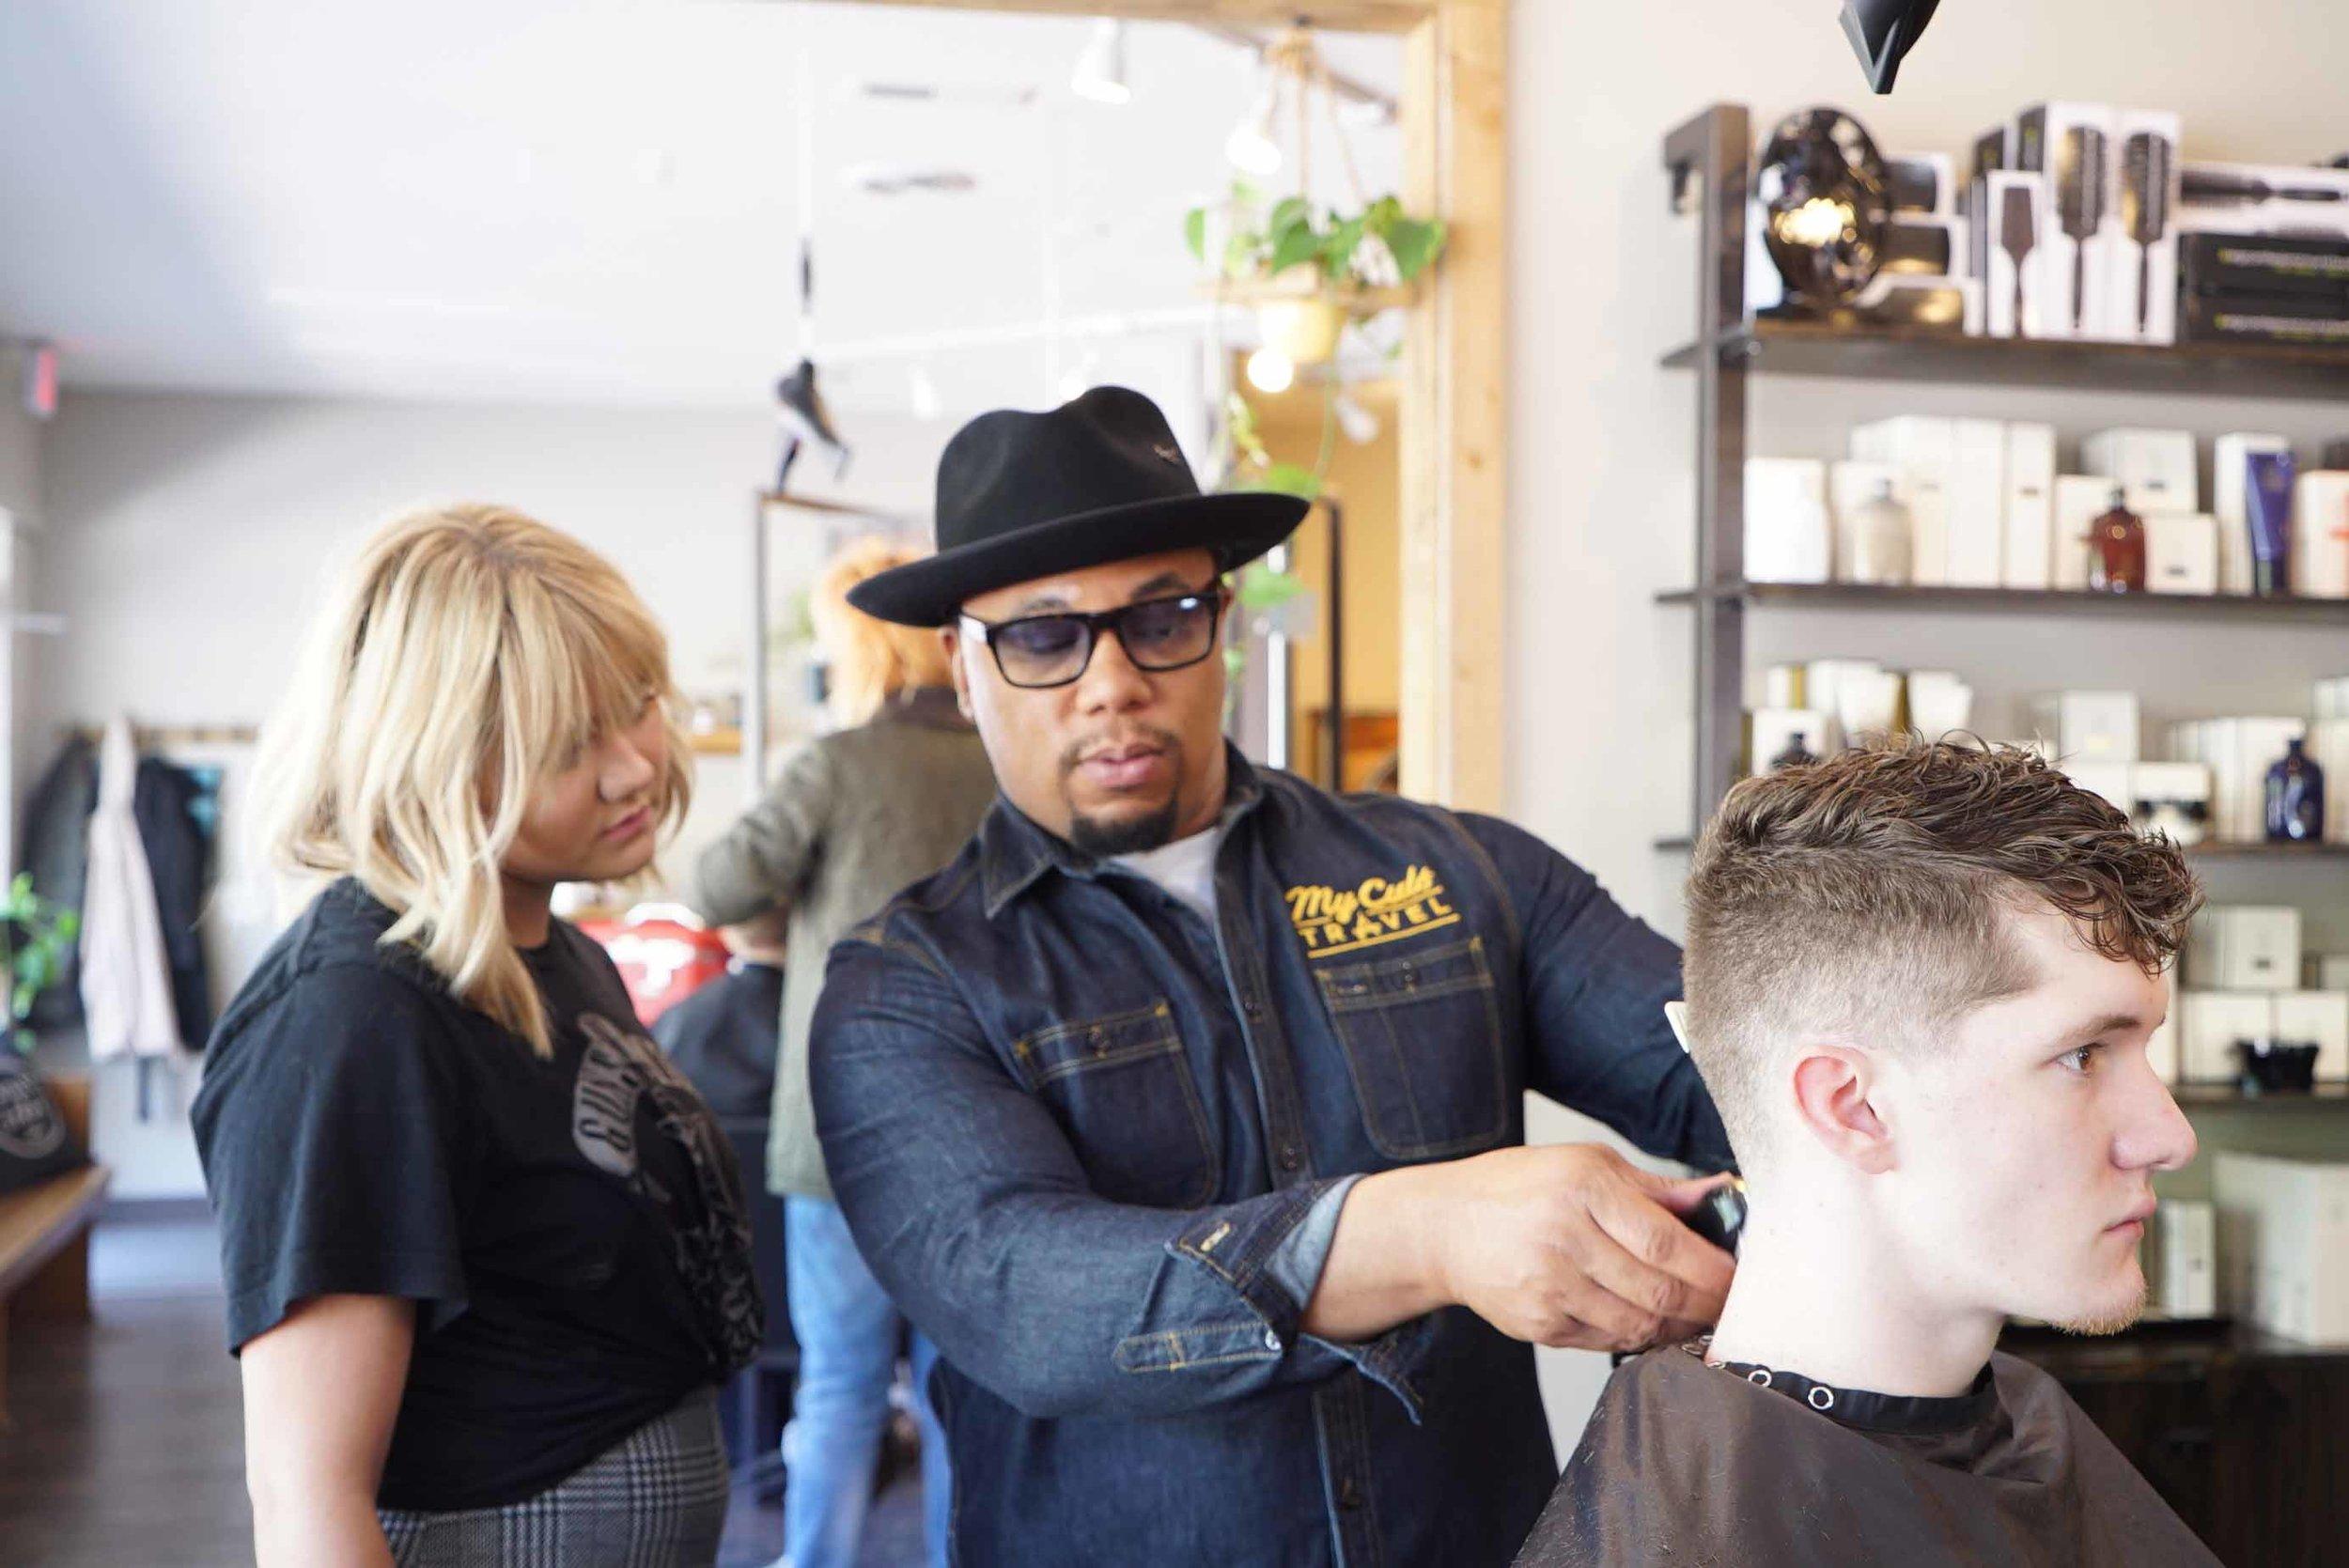 stylist-jobs-in-kansas-city-salonspa-connection-stylist-training.JPG